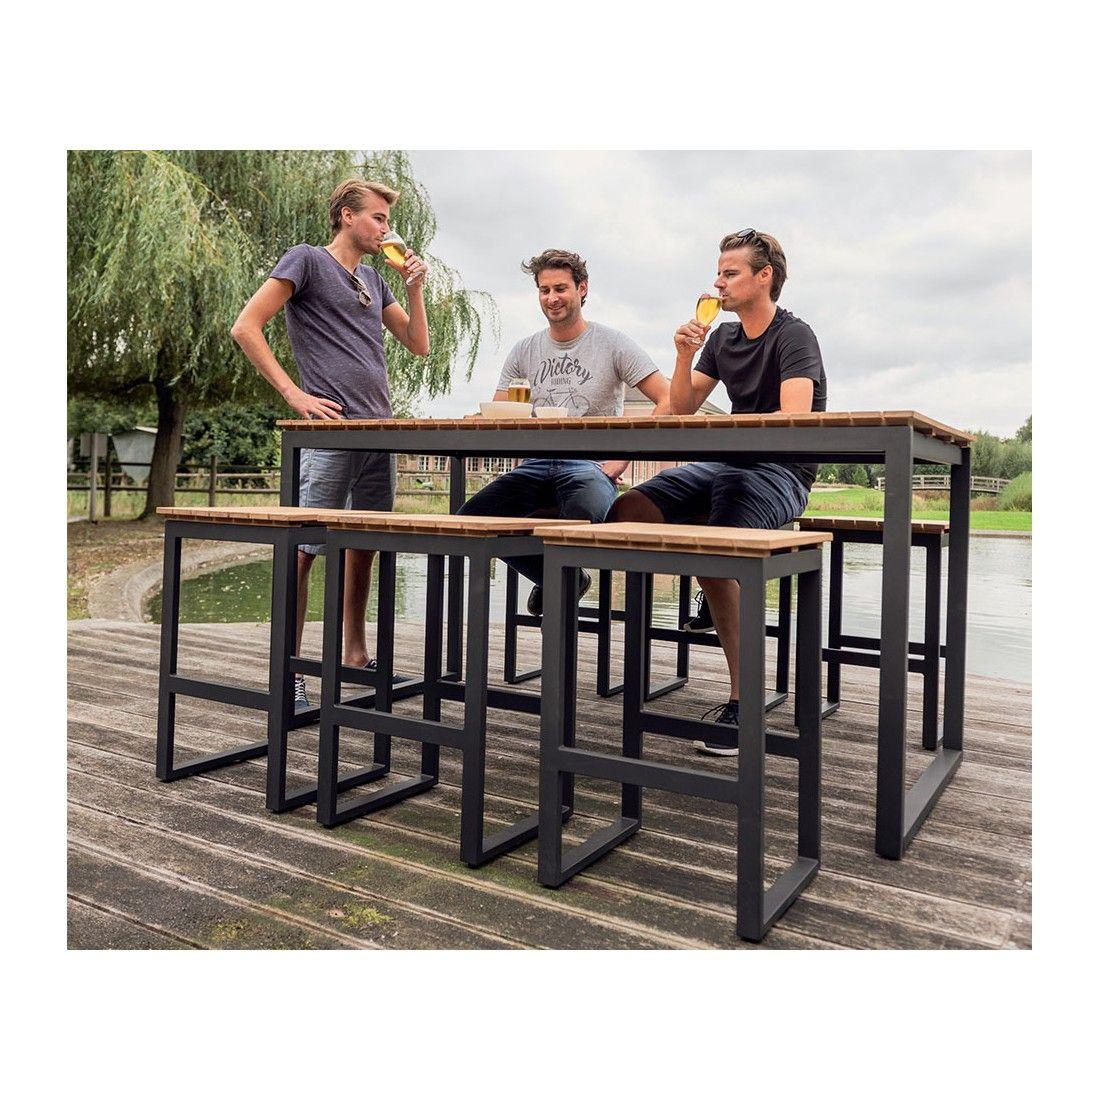 Table haute en teck avec pieds en alu, 180 cm Pisa